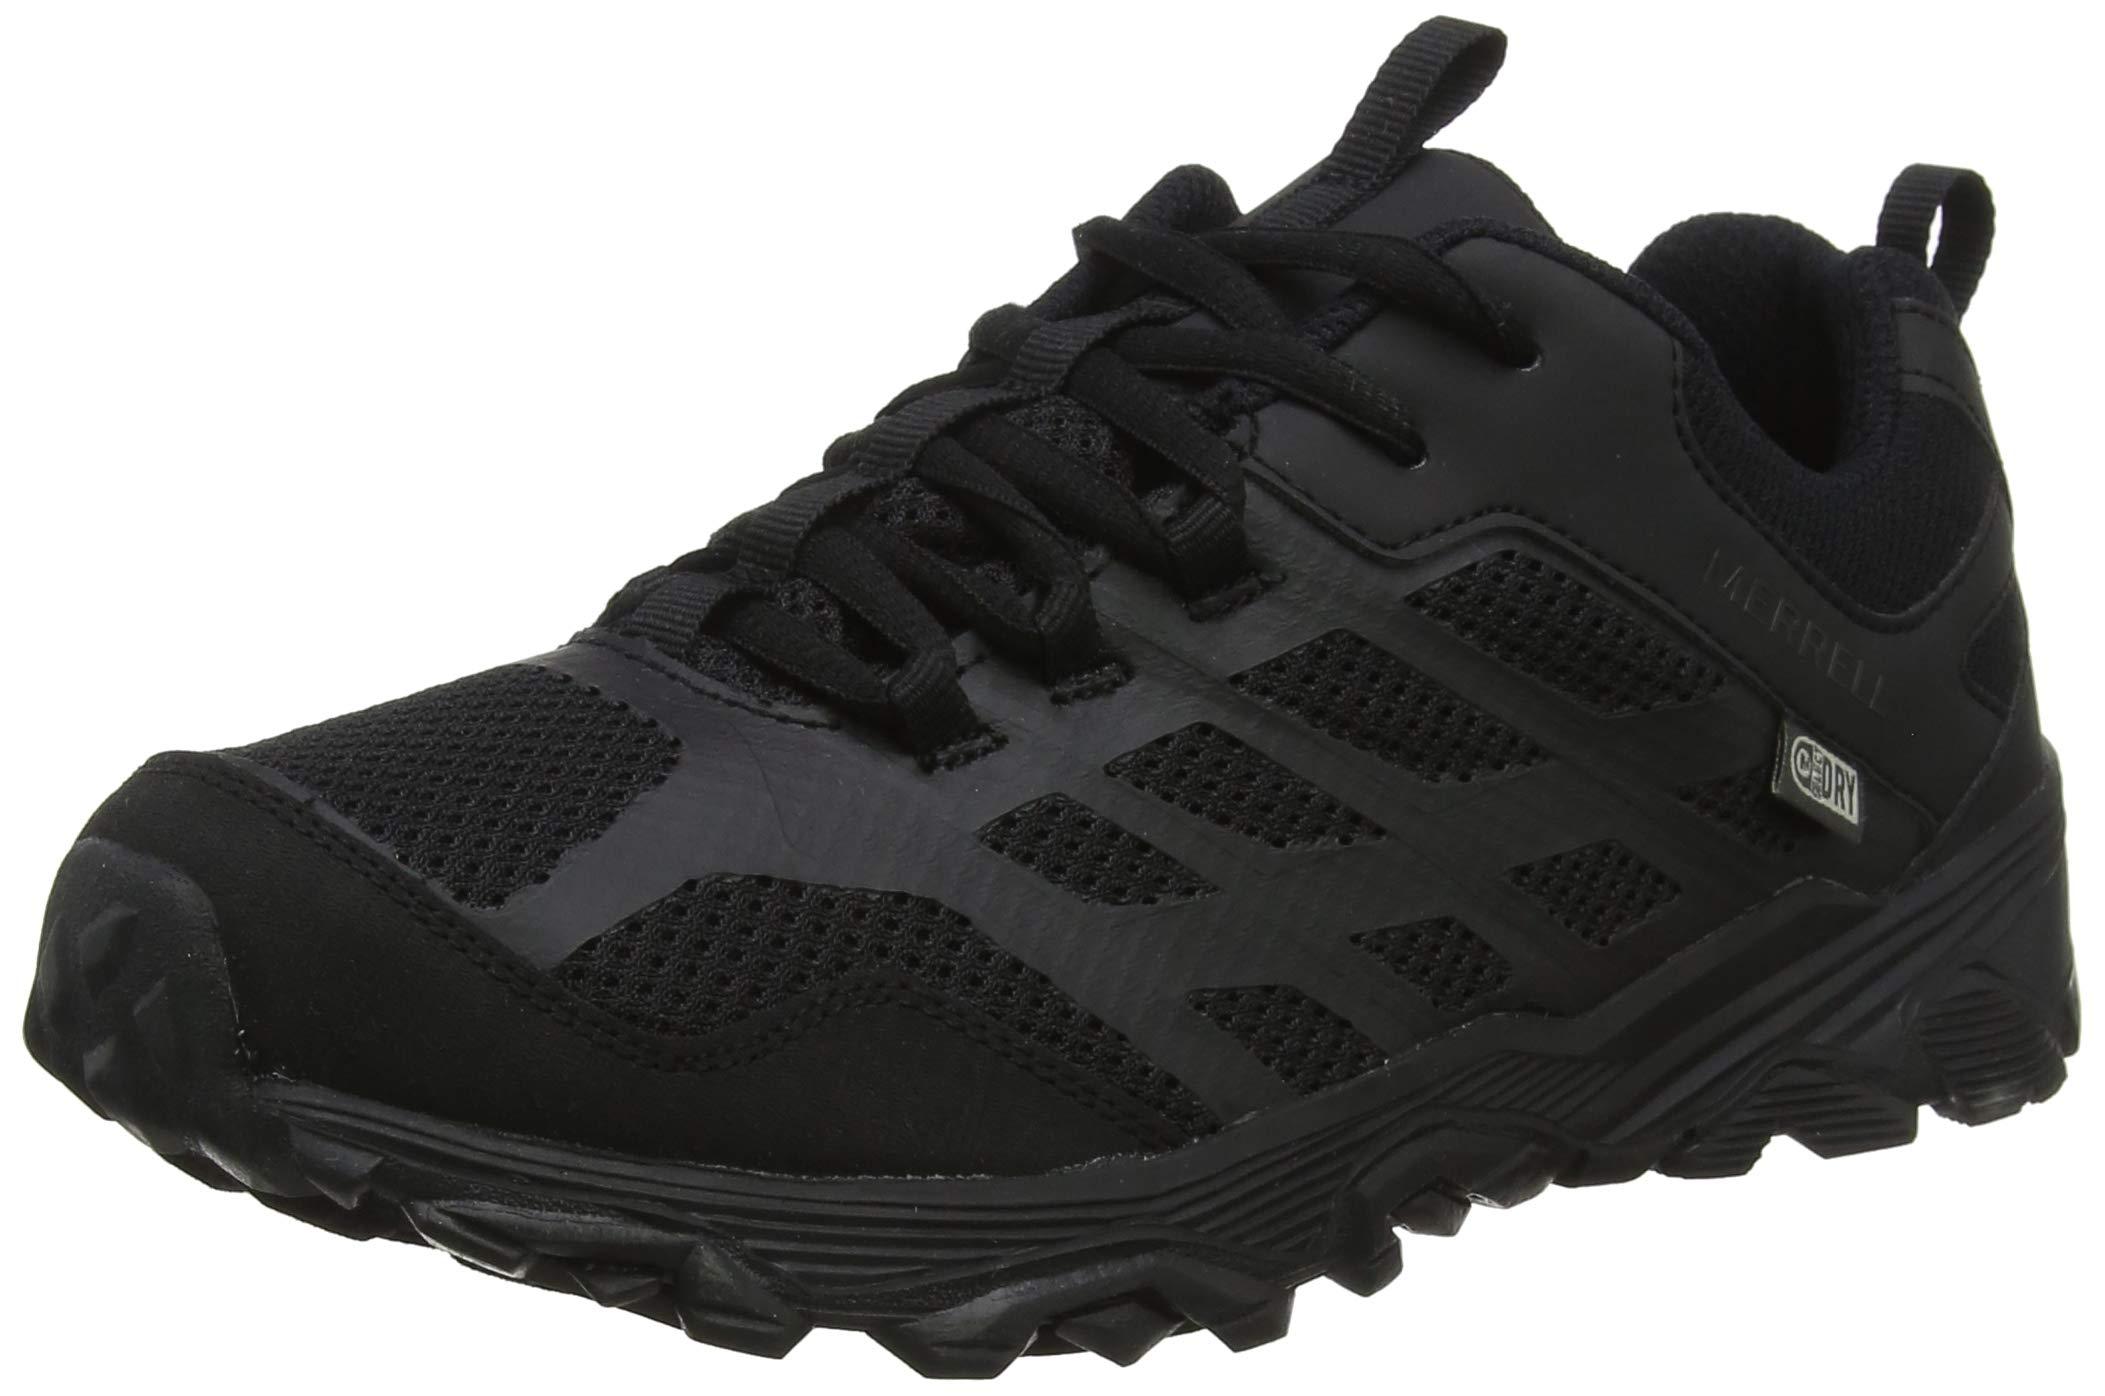 Merrell Unisex Kids' M-moab Fst Low Waterproof Rise Hiking Boots 1